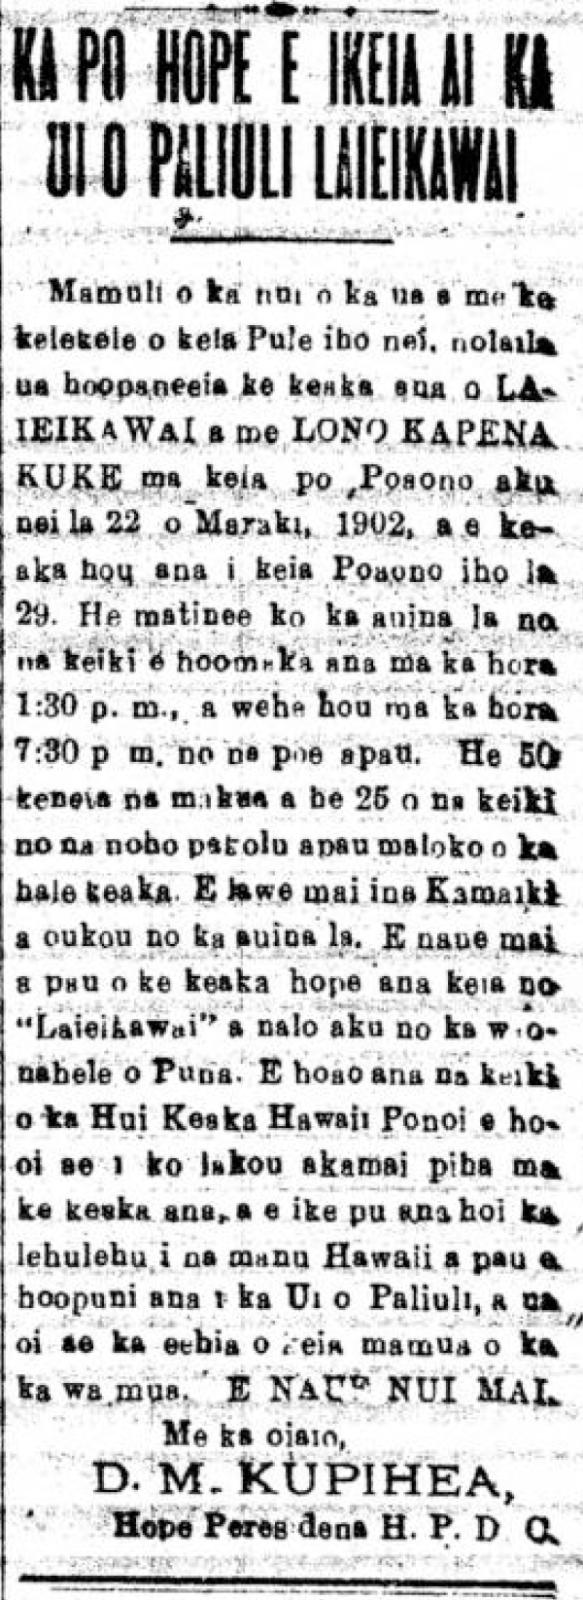 AlohaAina_3_29_1902_2.png